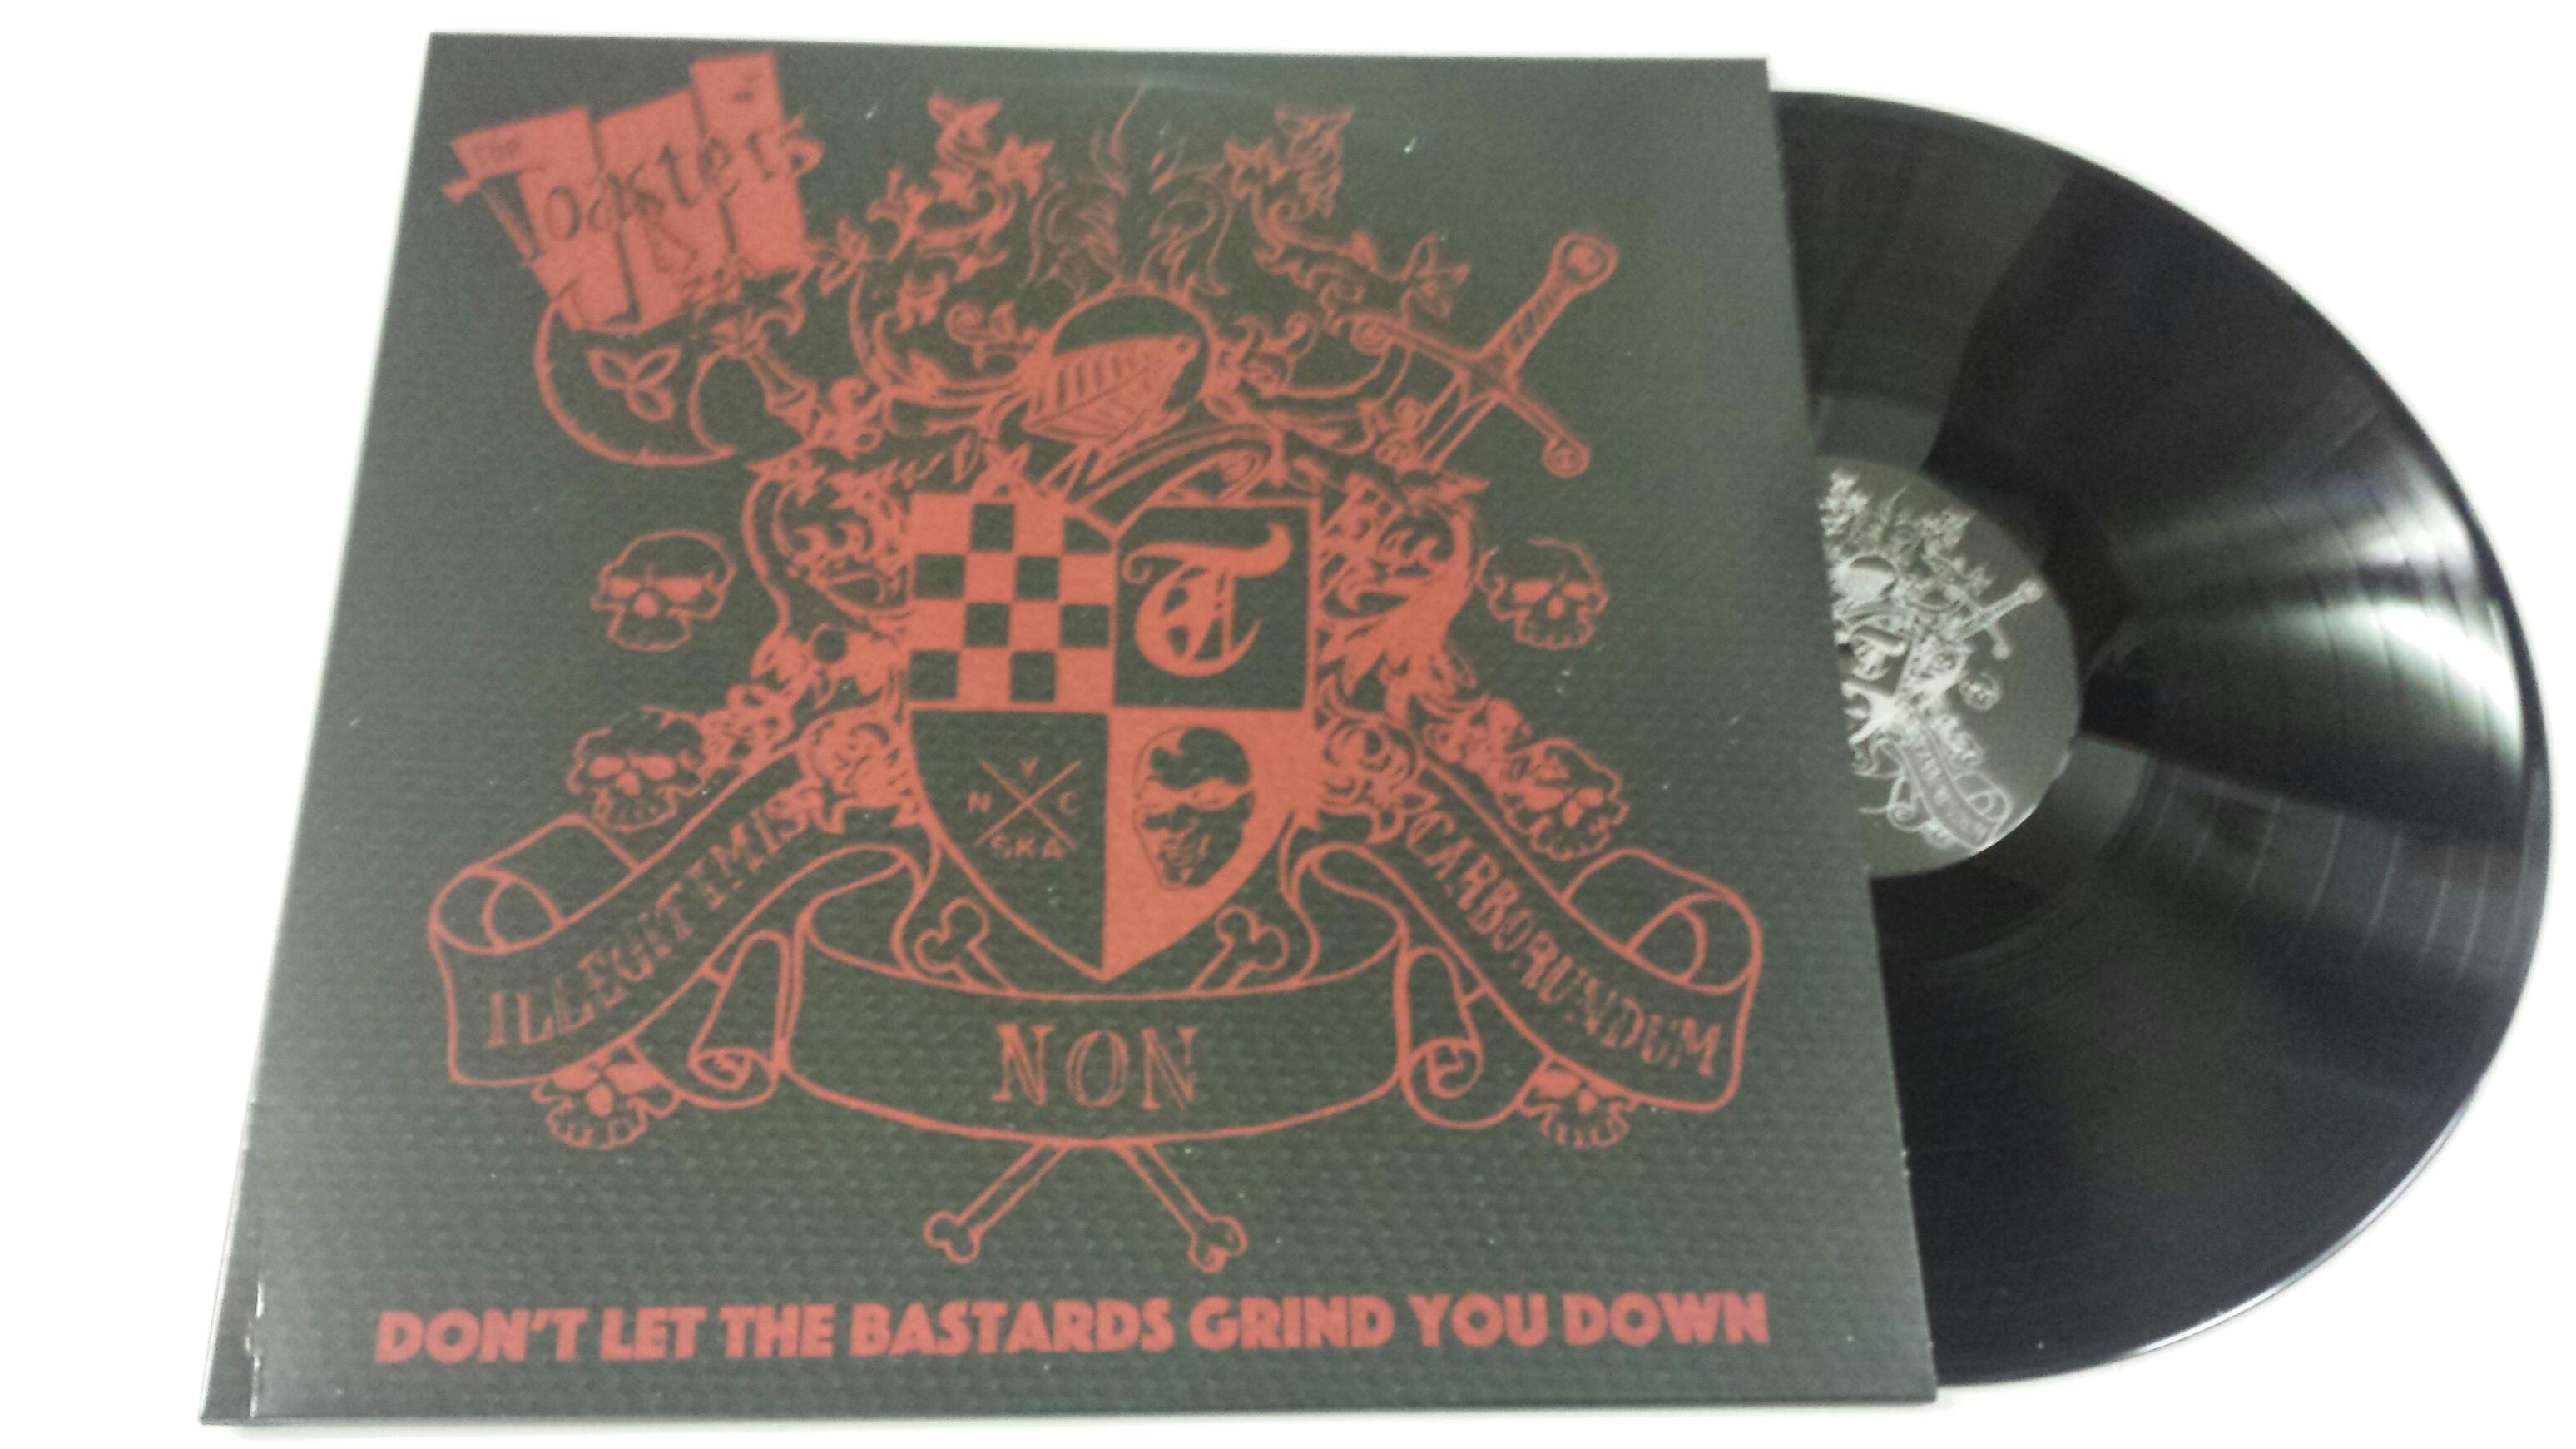 Toasters/DON'T LET THE BASTARDS GRIND LP